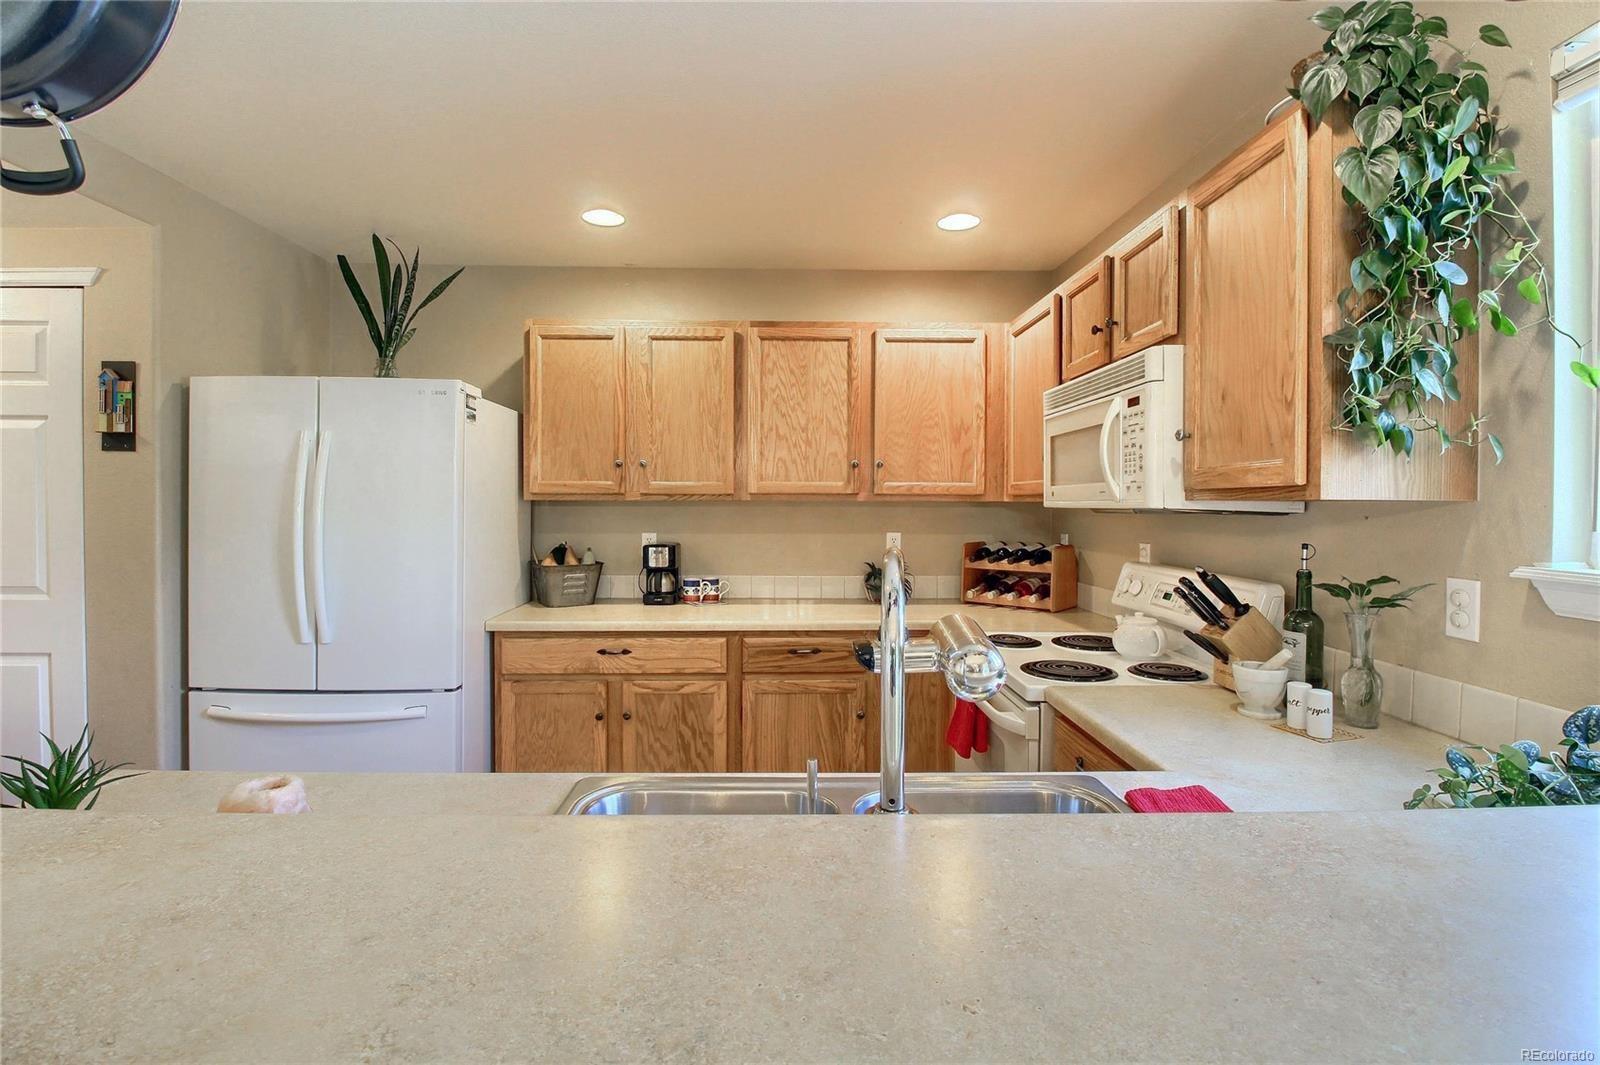 MLS# 3607545 - 11 - 5604 Mount Sanitas Avenue, Longmont, CO 80503